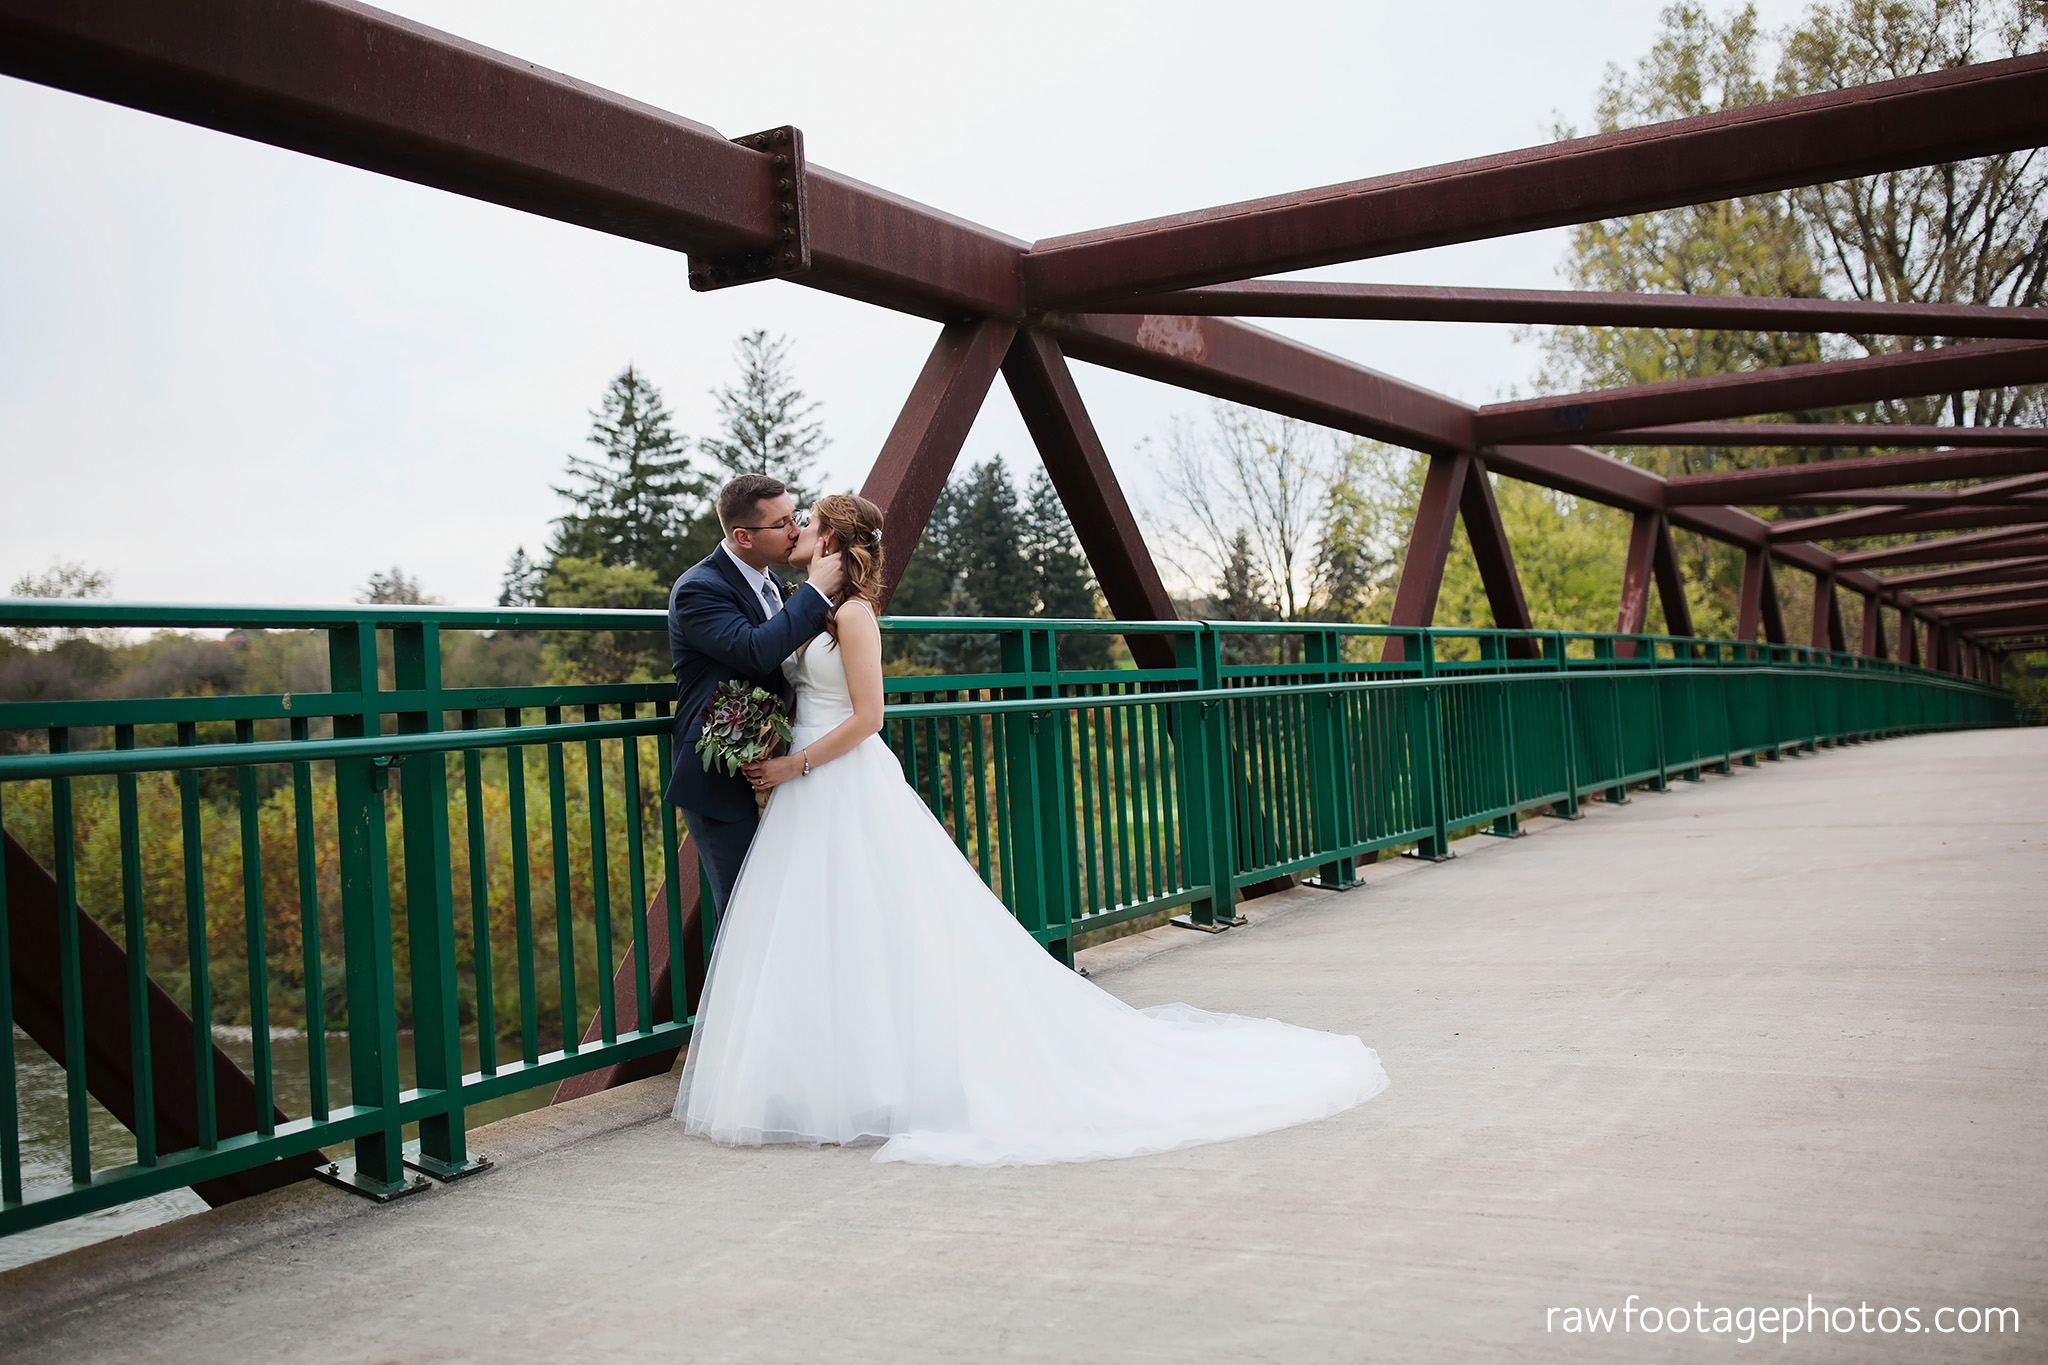 london_ontario_wedding_photographer-civic_gardens-springbank_park-succulent_bouquet-fall_wedding-bridge-raw_footage_photography066.jpg